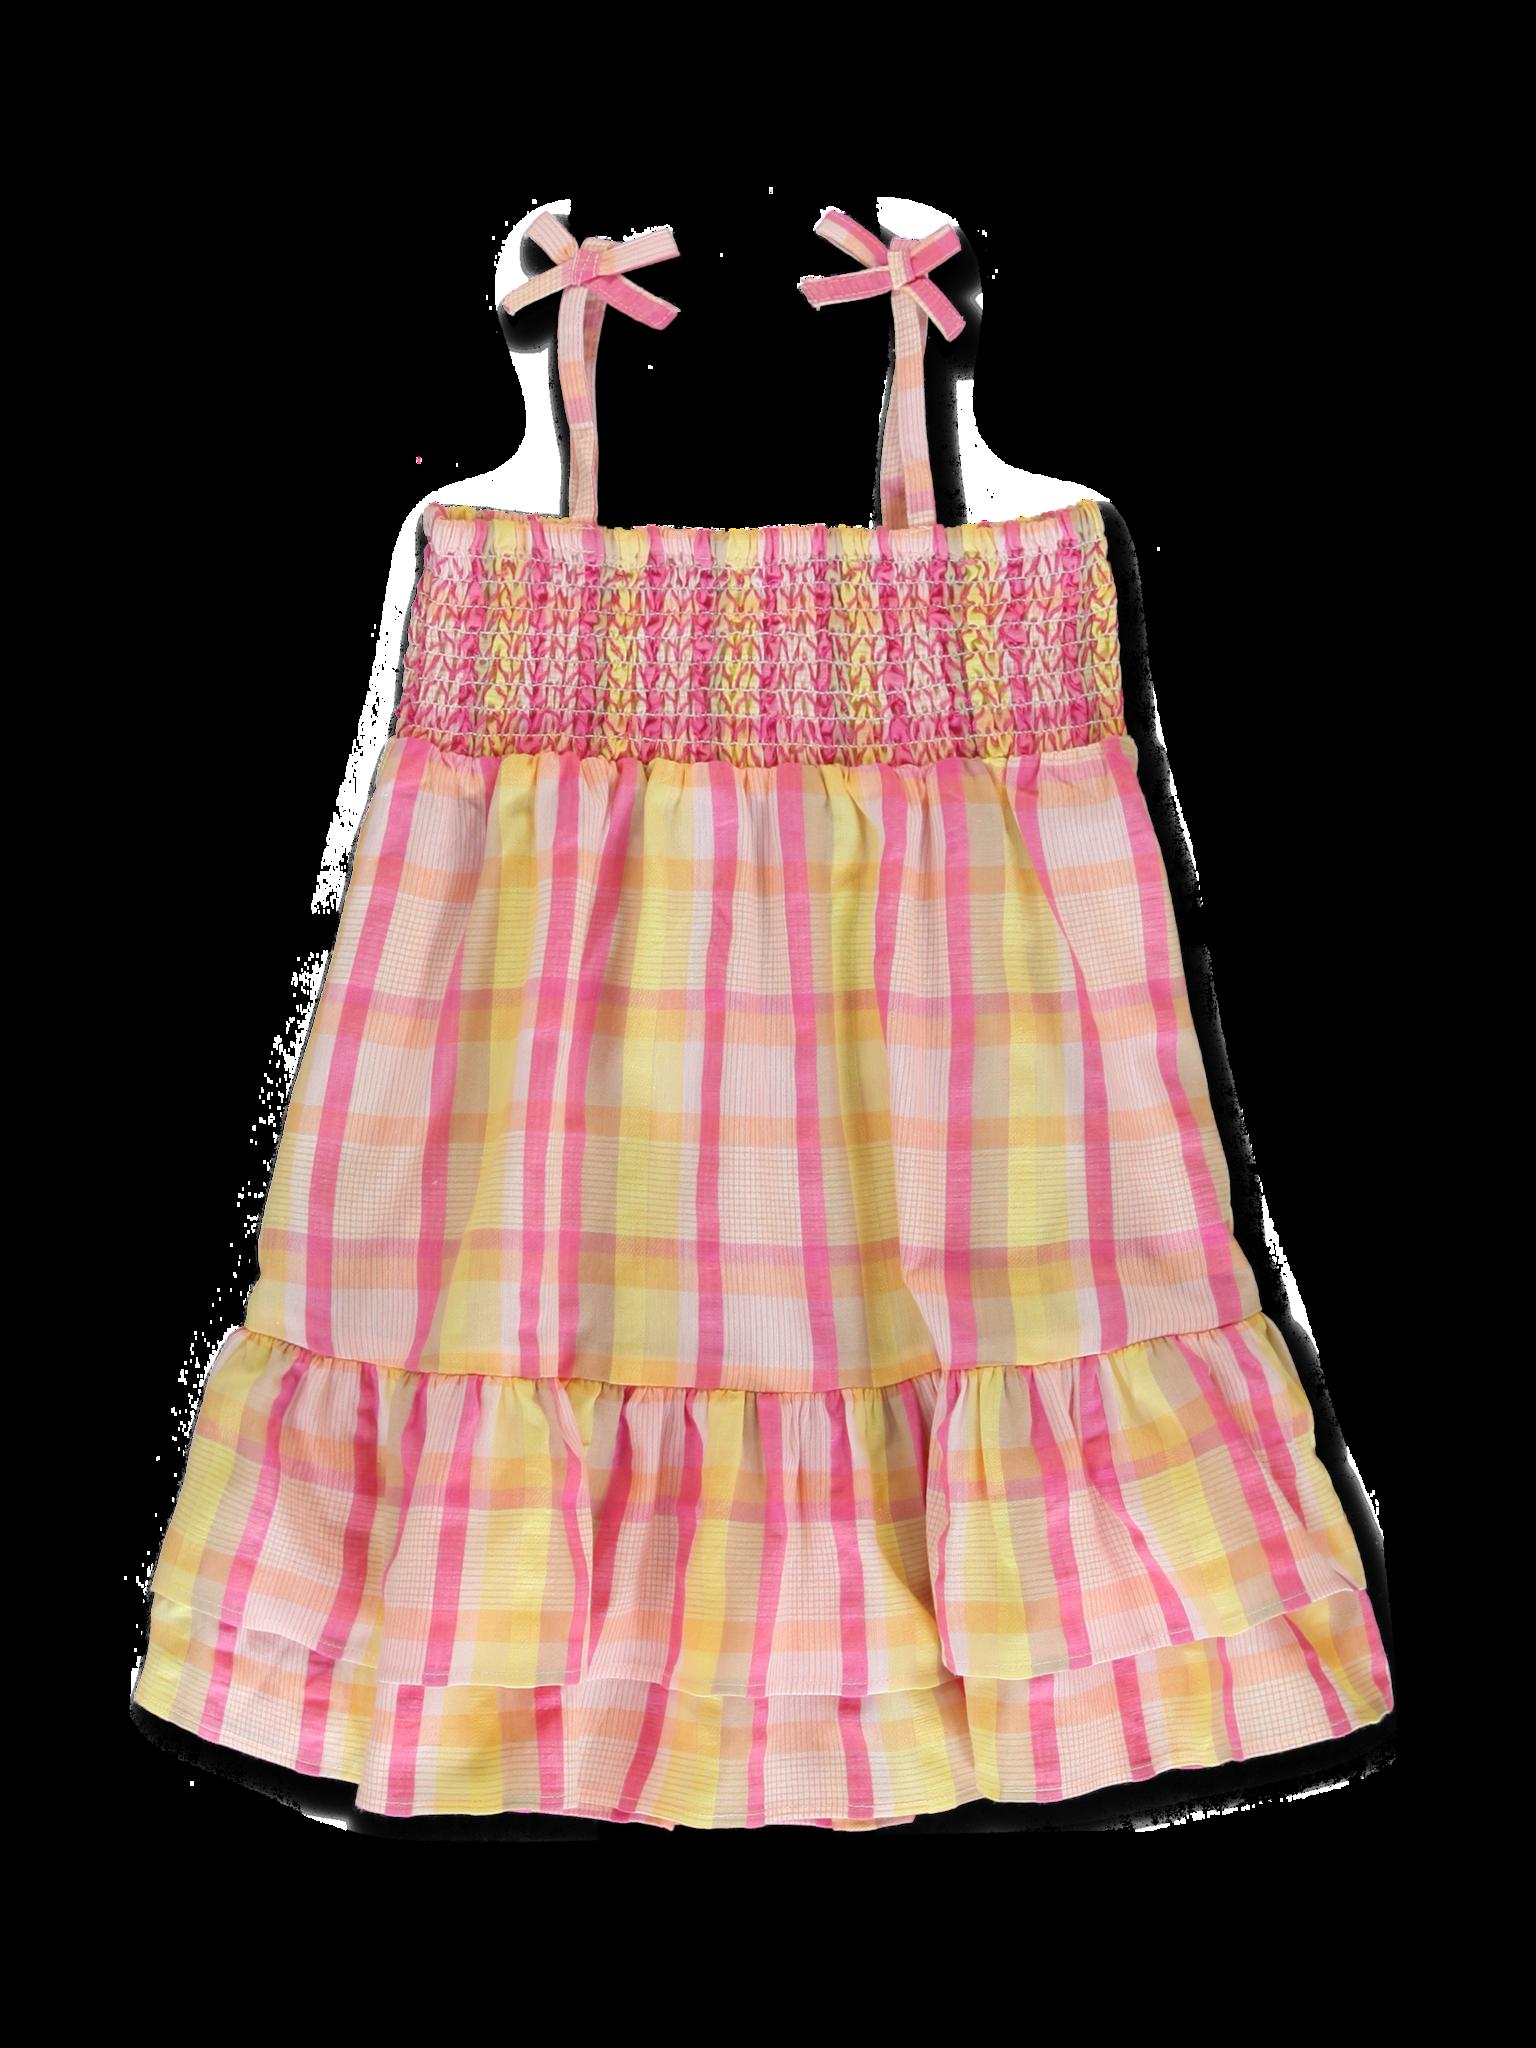 Lemon Beret | Summer 2020 Small Girls | Dress | 10 pcs/box